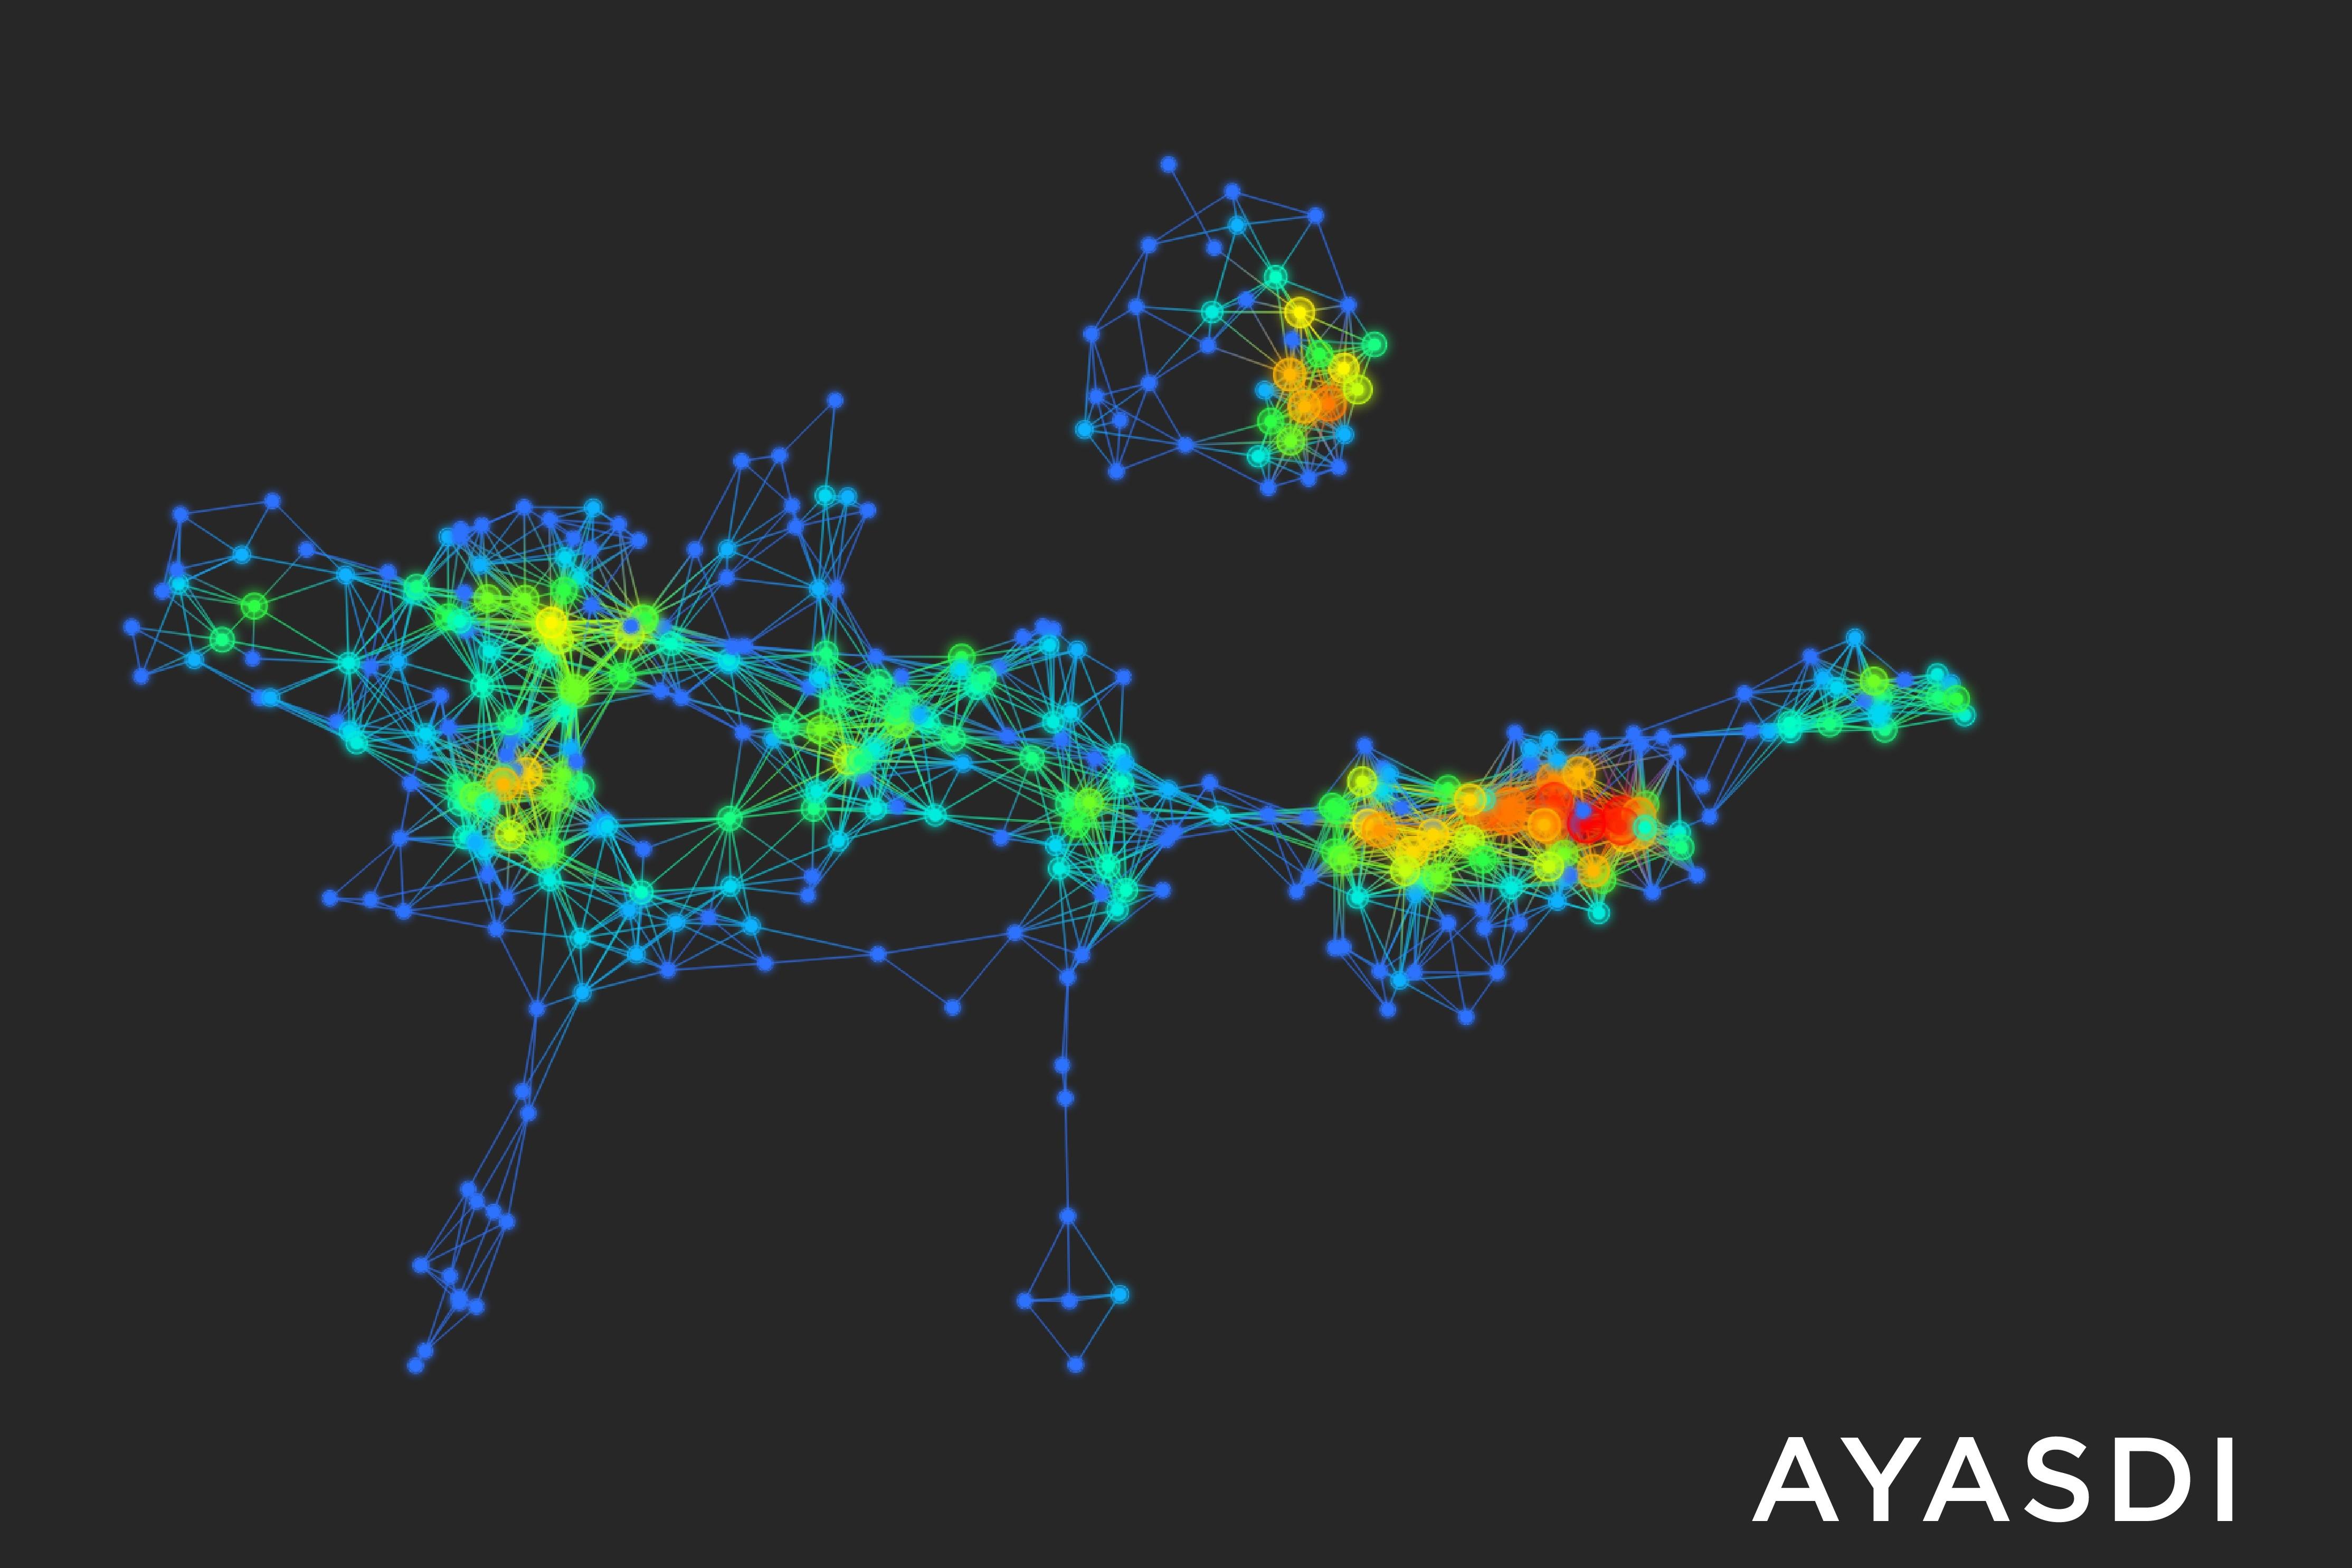 One of Ayasdi's graph-like data maps